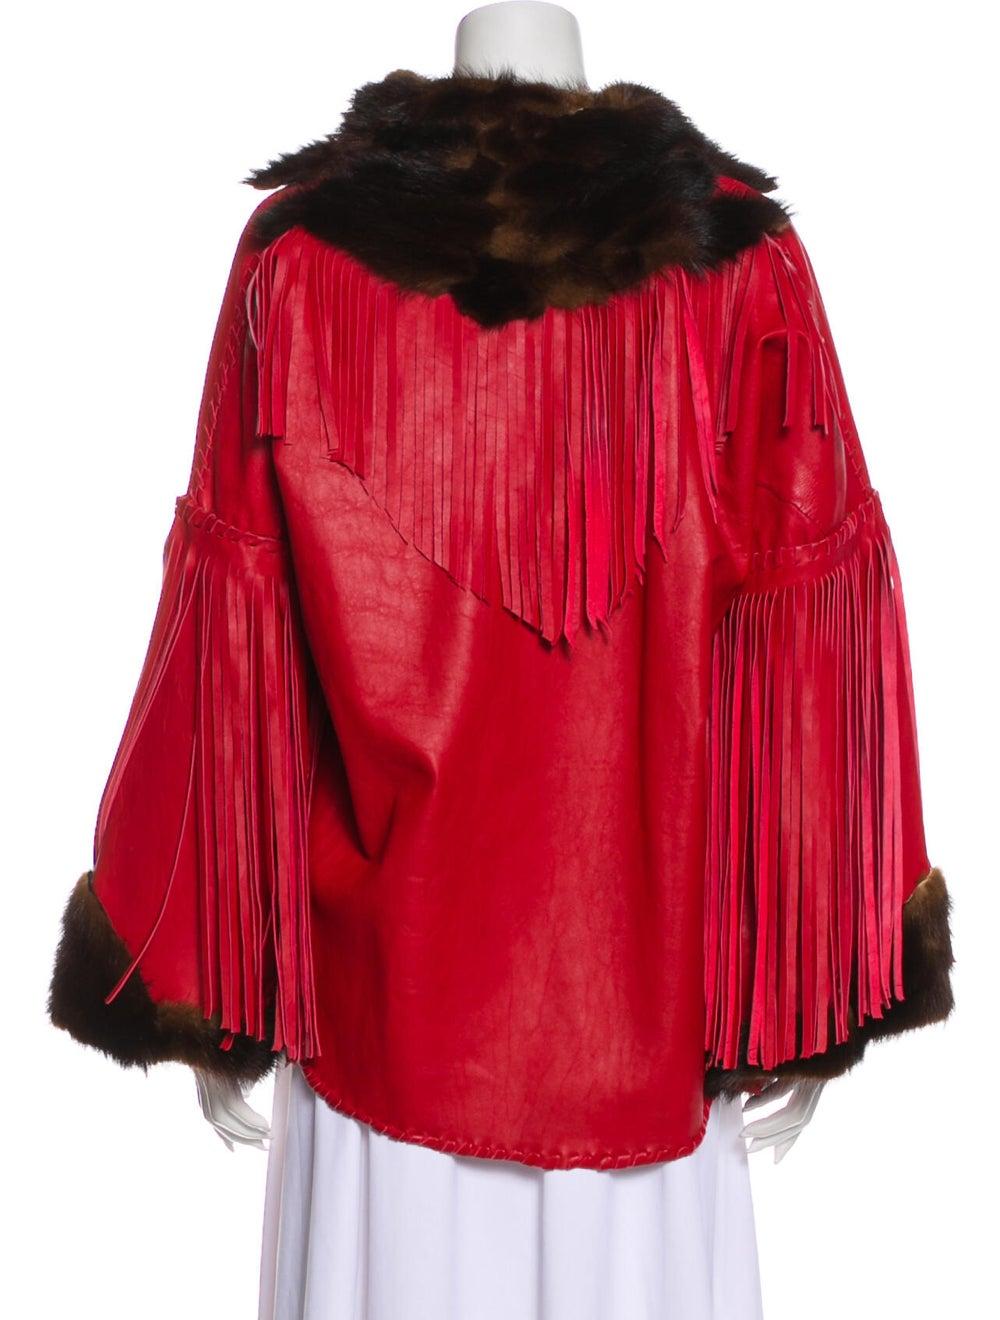 Fur Cape Red - image 3